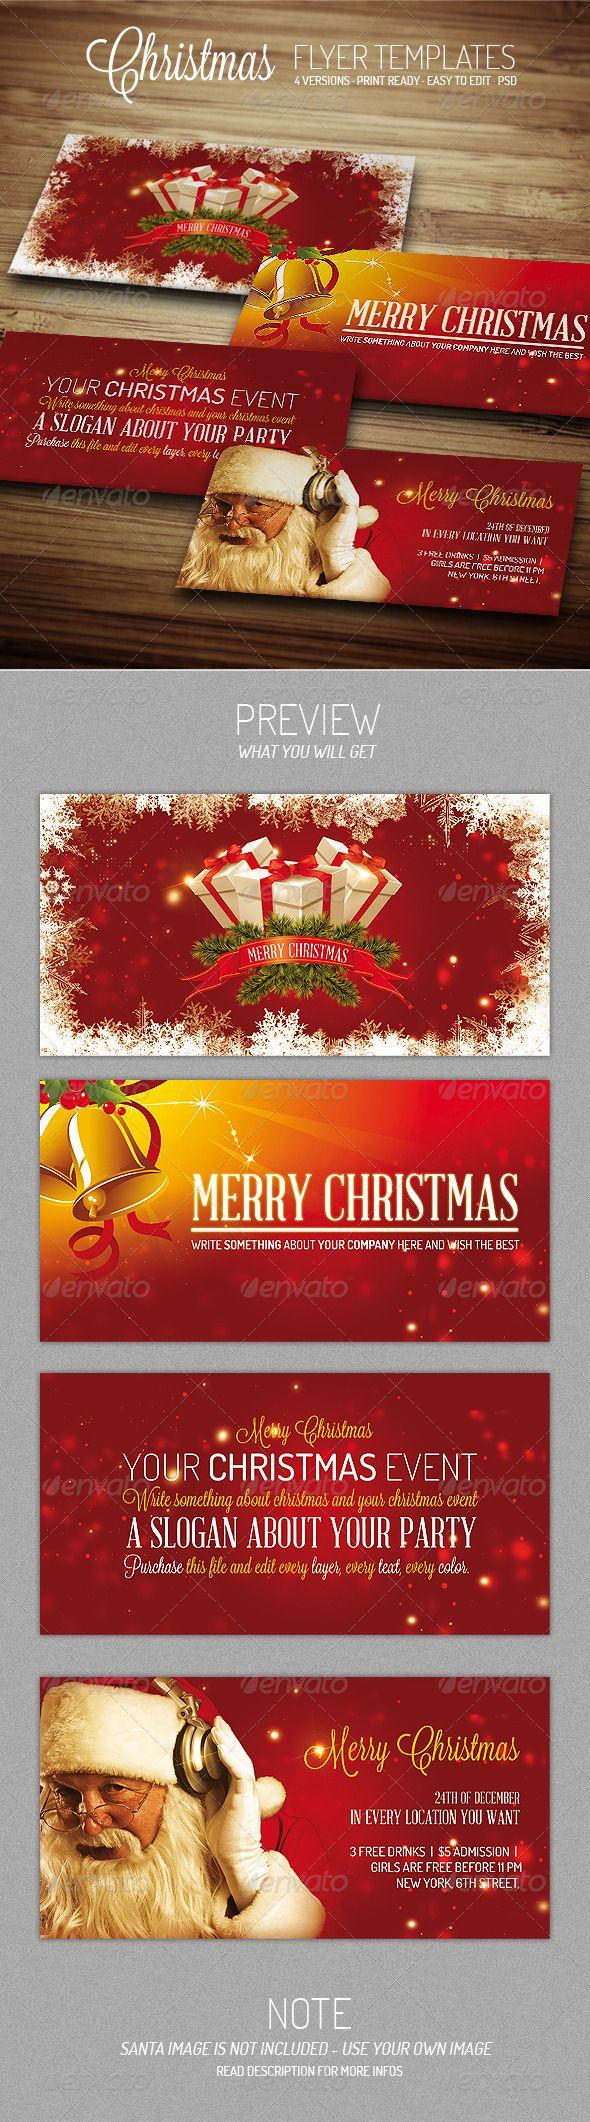 company christmas party invitation templates%0A Christmas III  Flyer Template